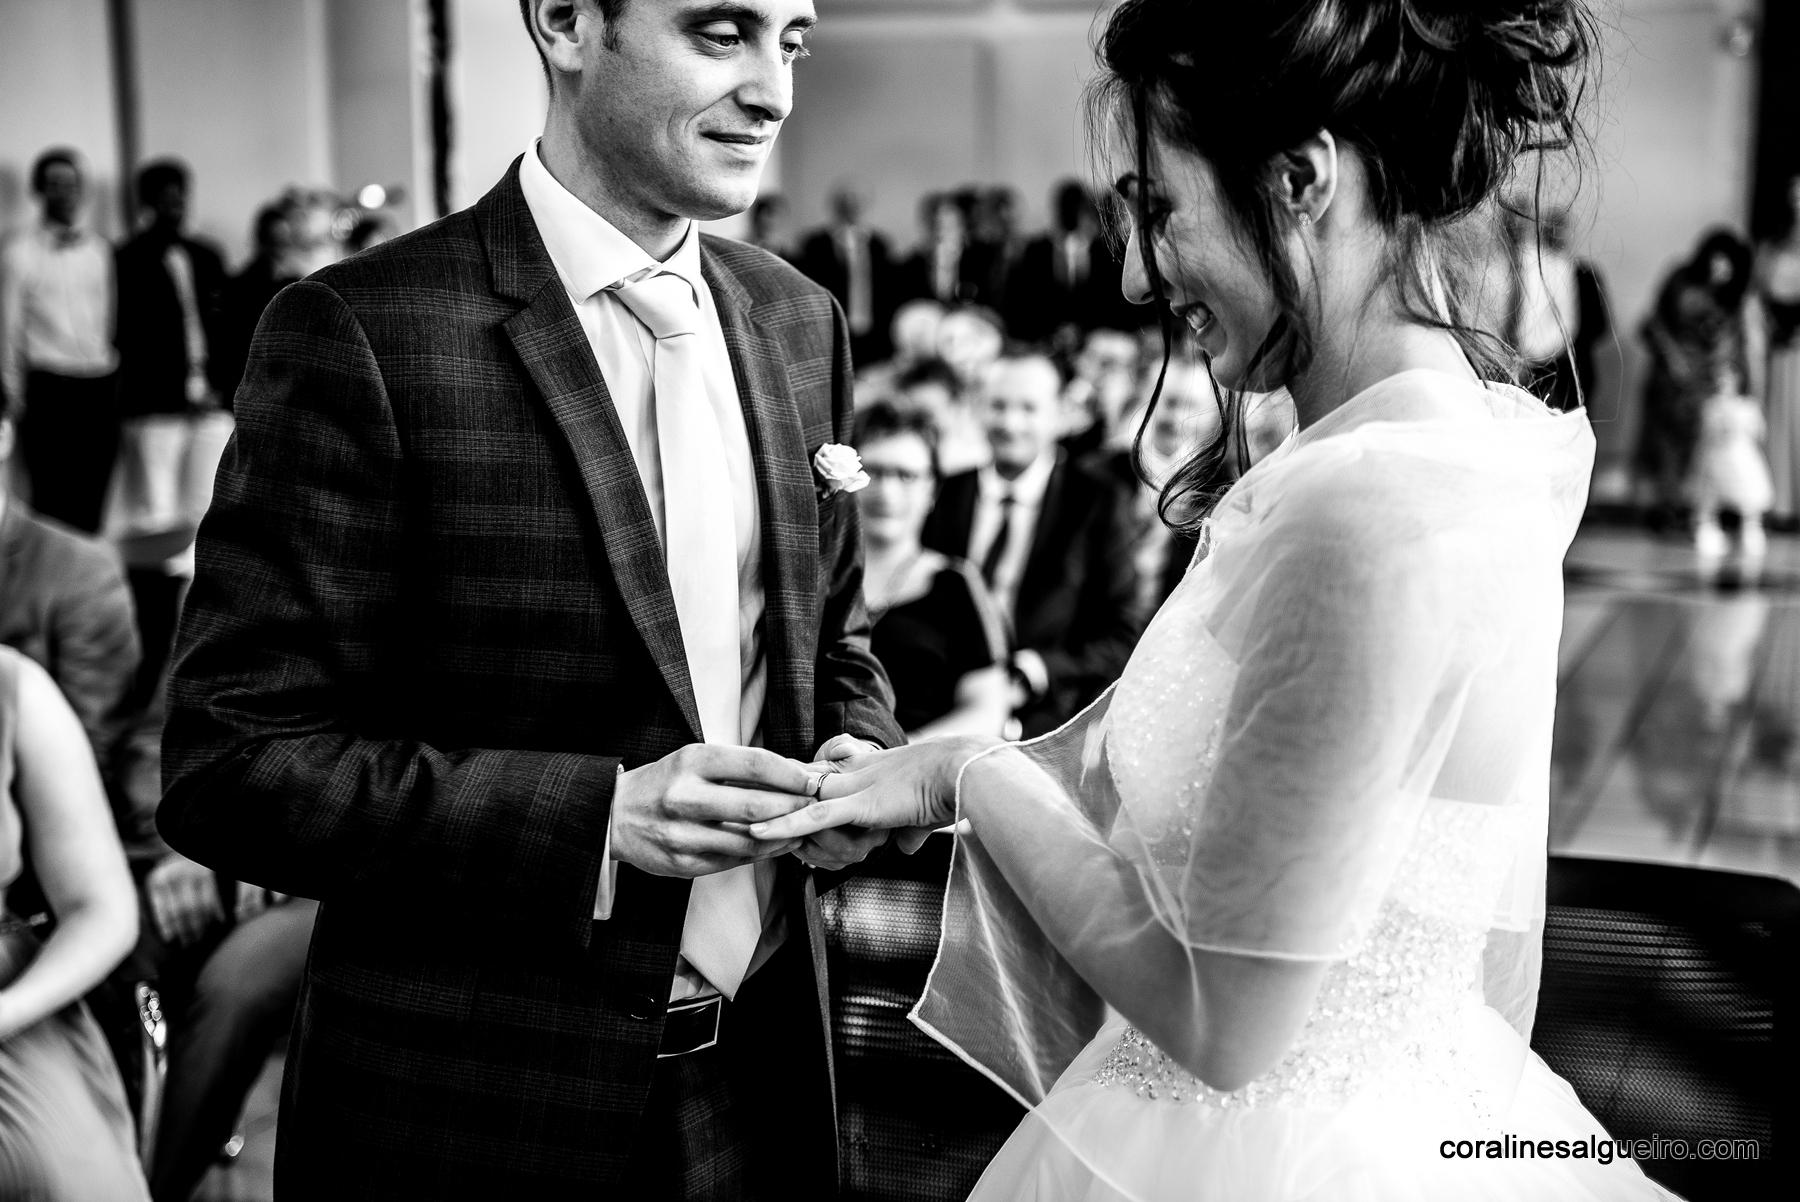 photographe mariage Rouen, Photographe mariage Rouen, avec Laetitia & Johann